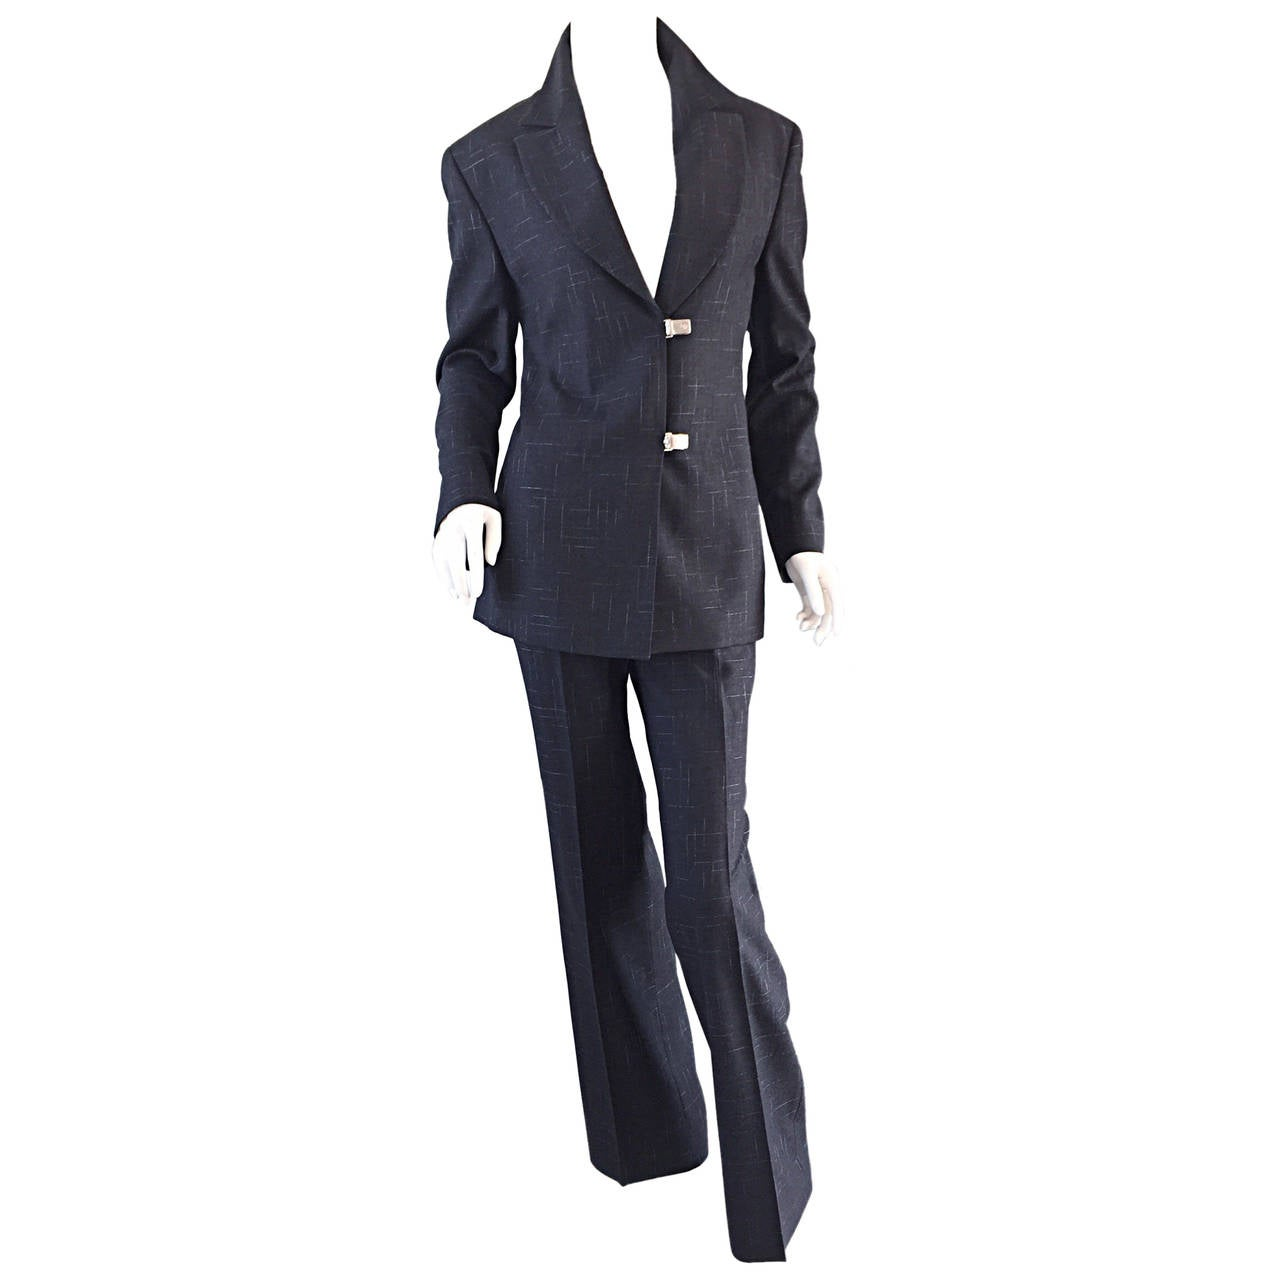 Vintage Gianni Versace Couture Charcoal Gray ' Windowpane ' Pant Suit Sz. 44